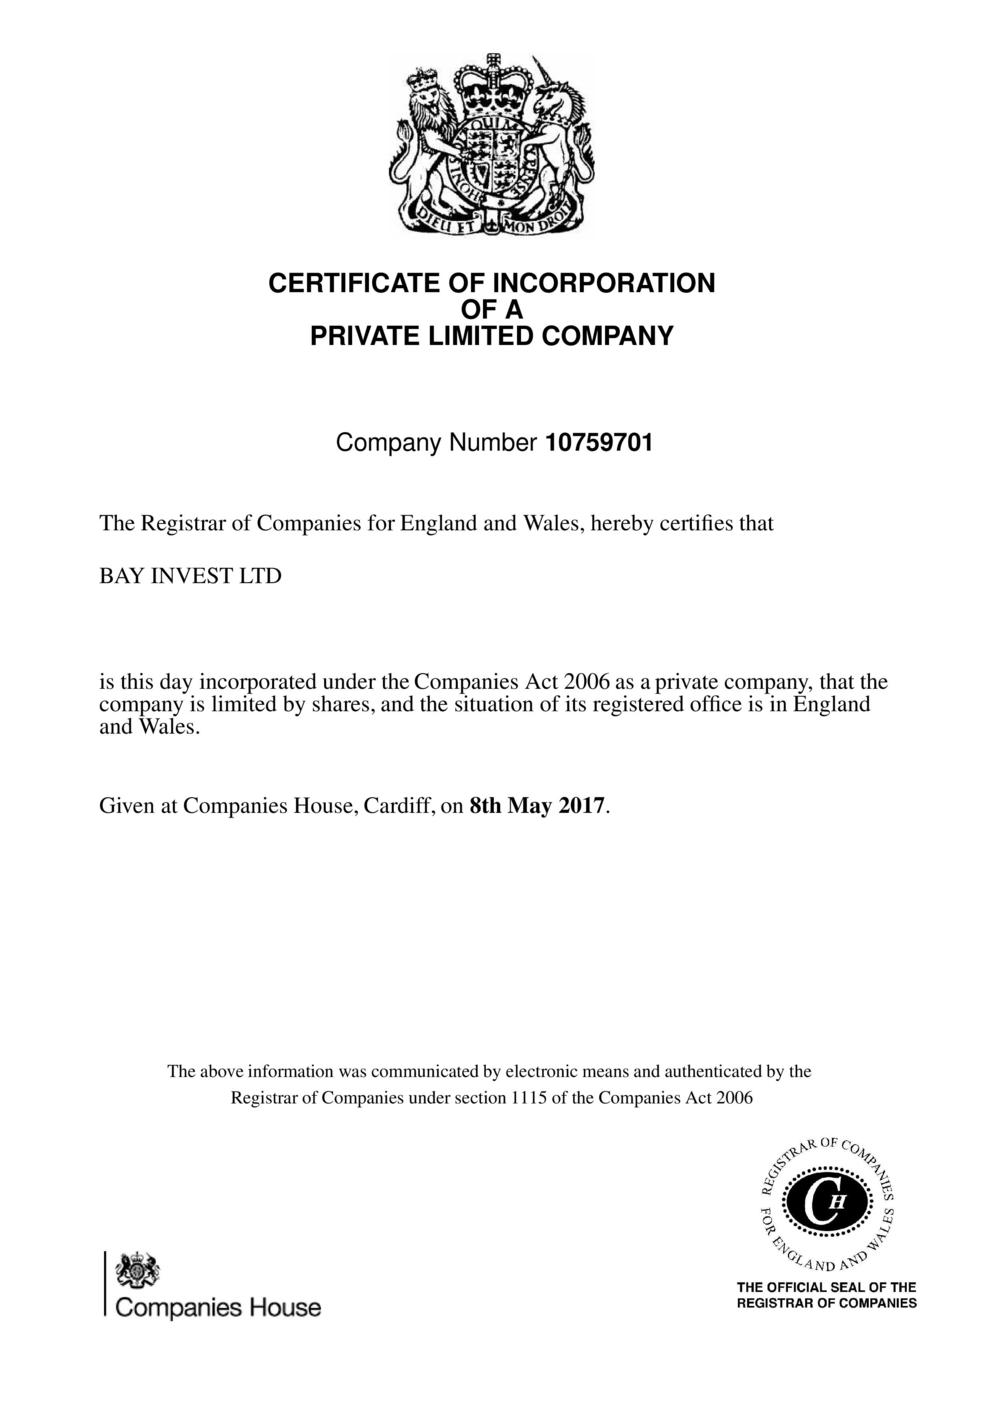 our_company_de562f09da6fff801d798b3c843a